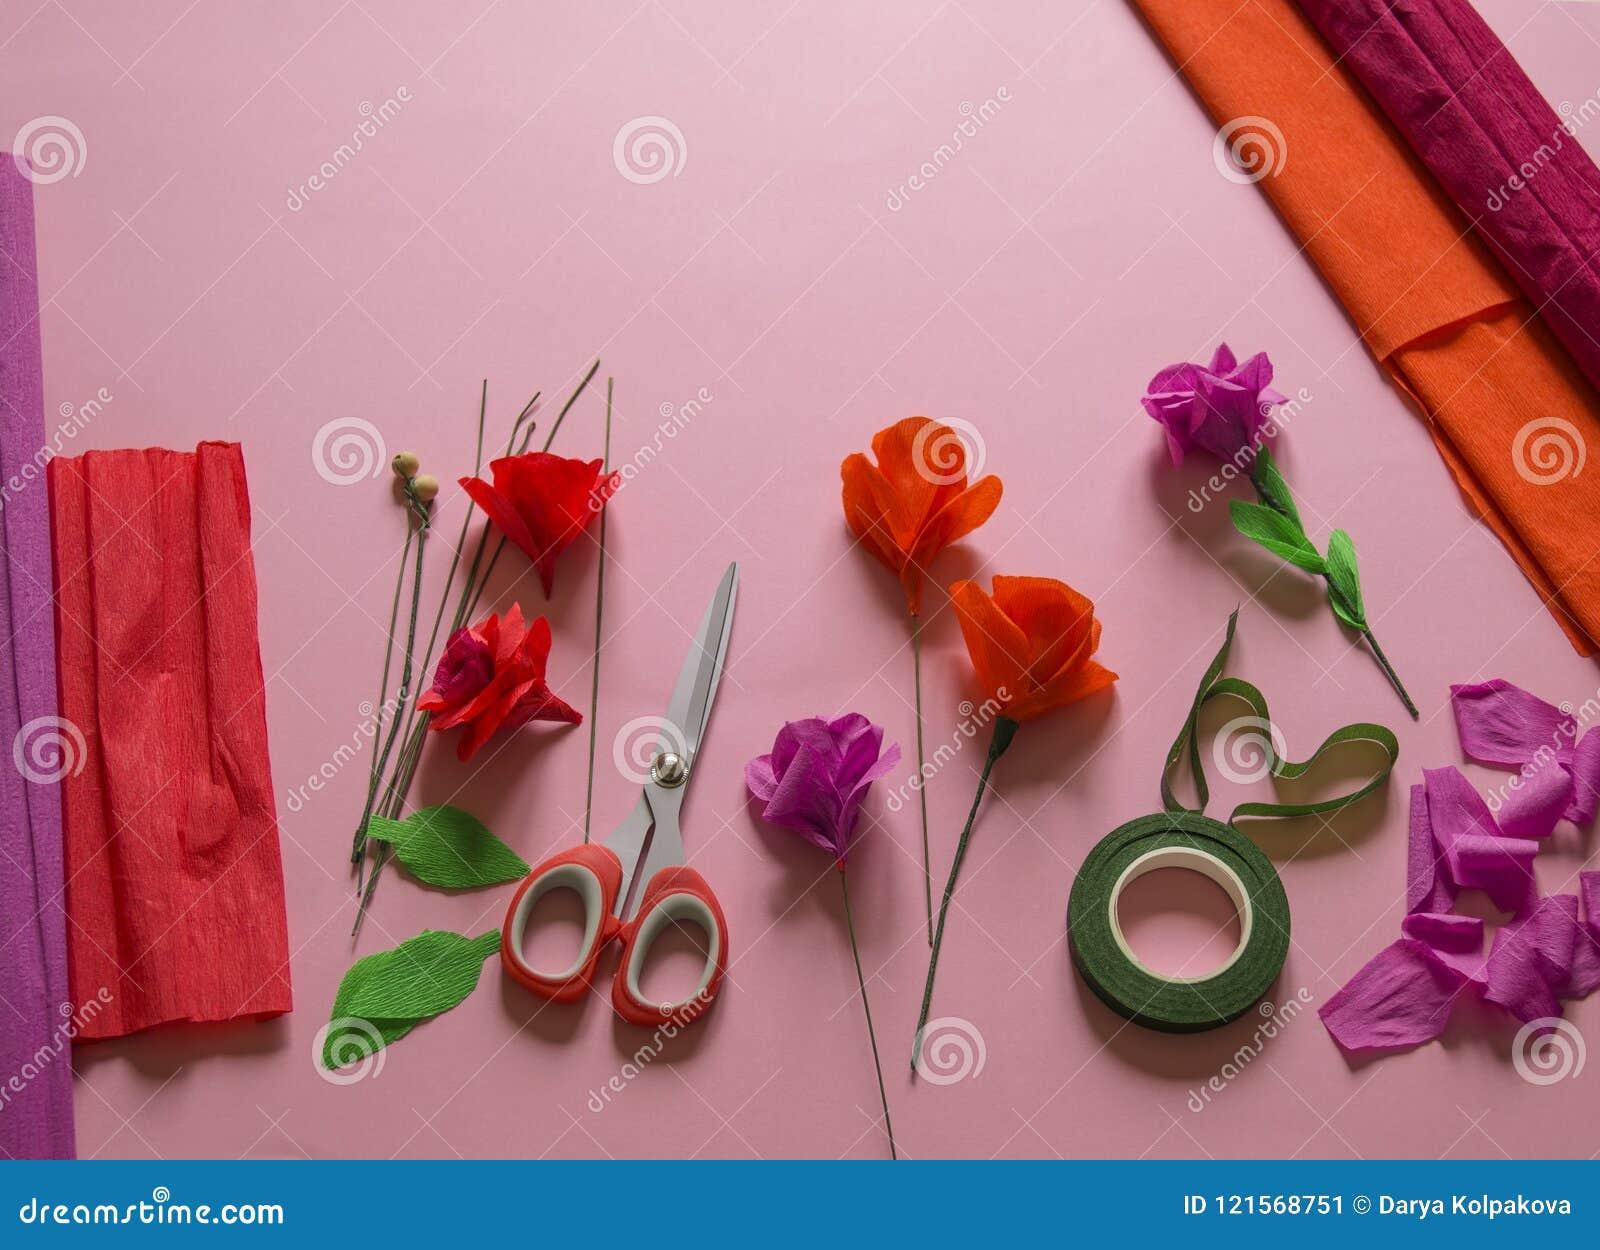 Materials to create a flower handmade paper flower crepe paper materials to create a flower handmade paper flower crepe paper mightylinksfo